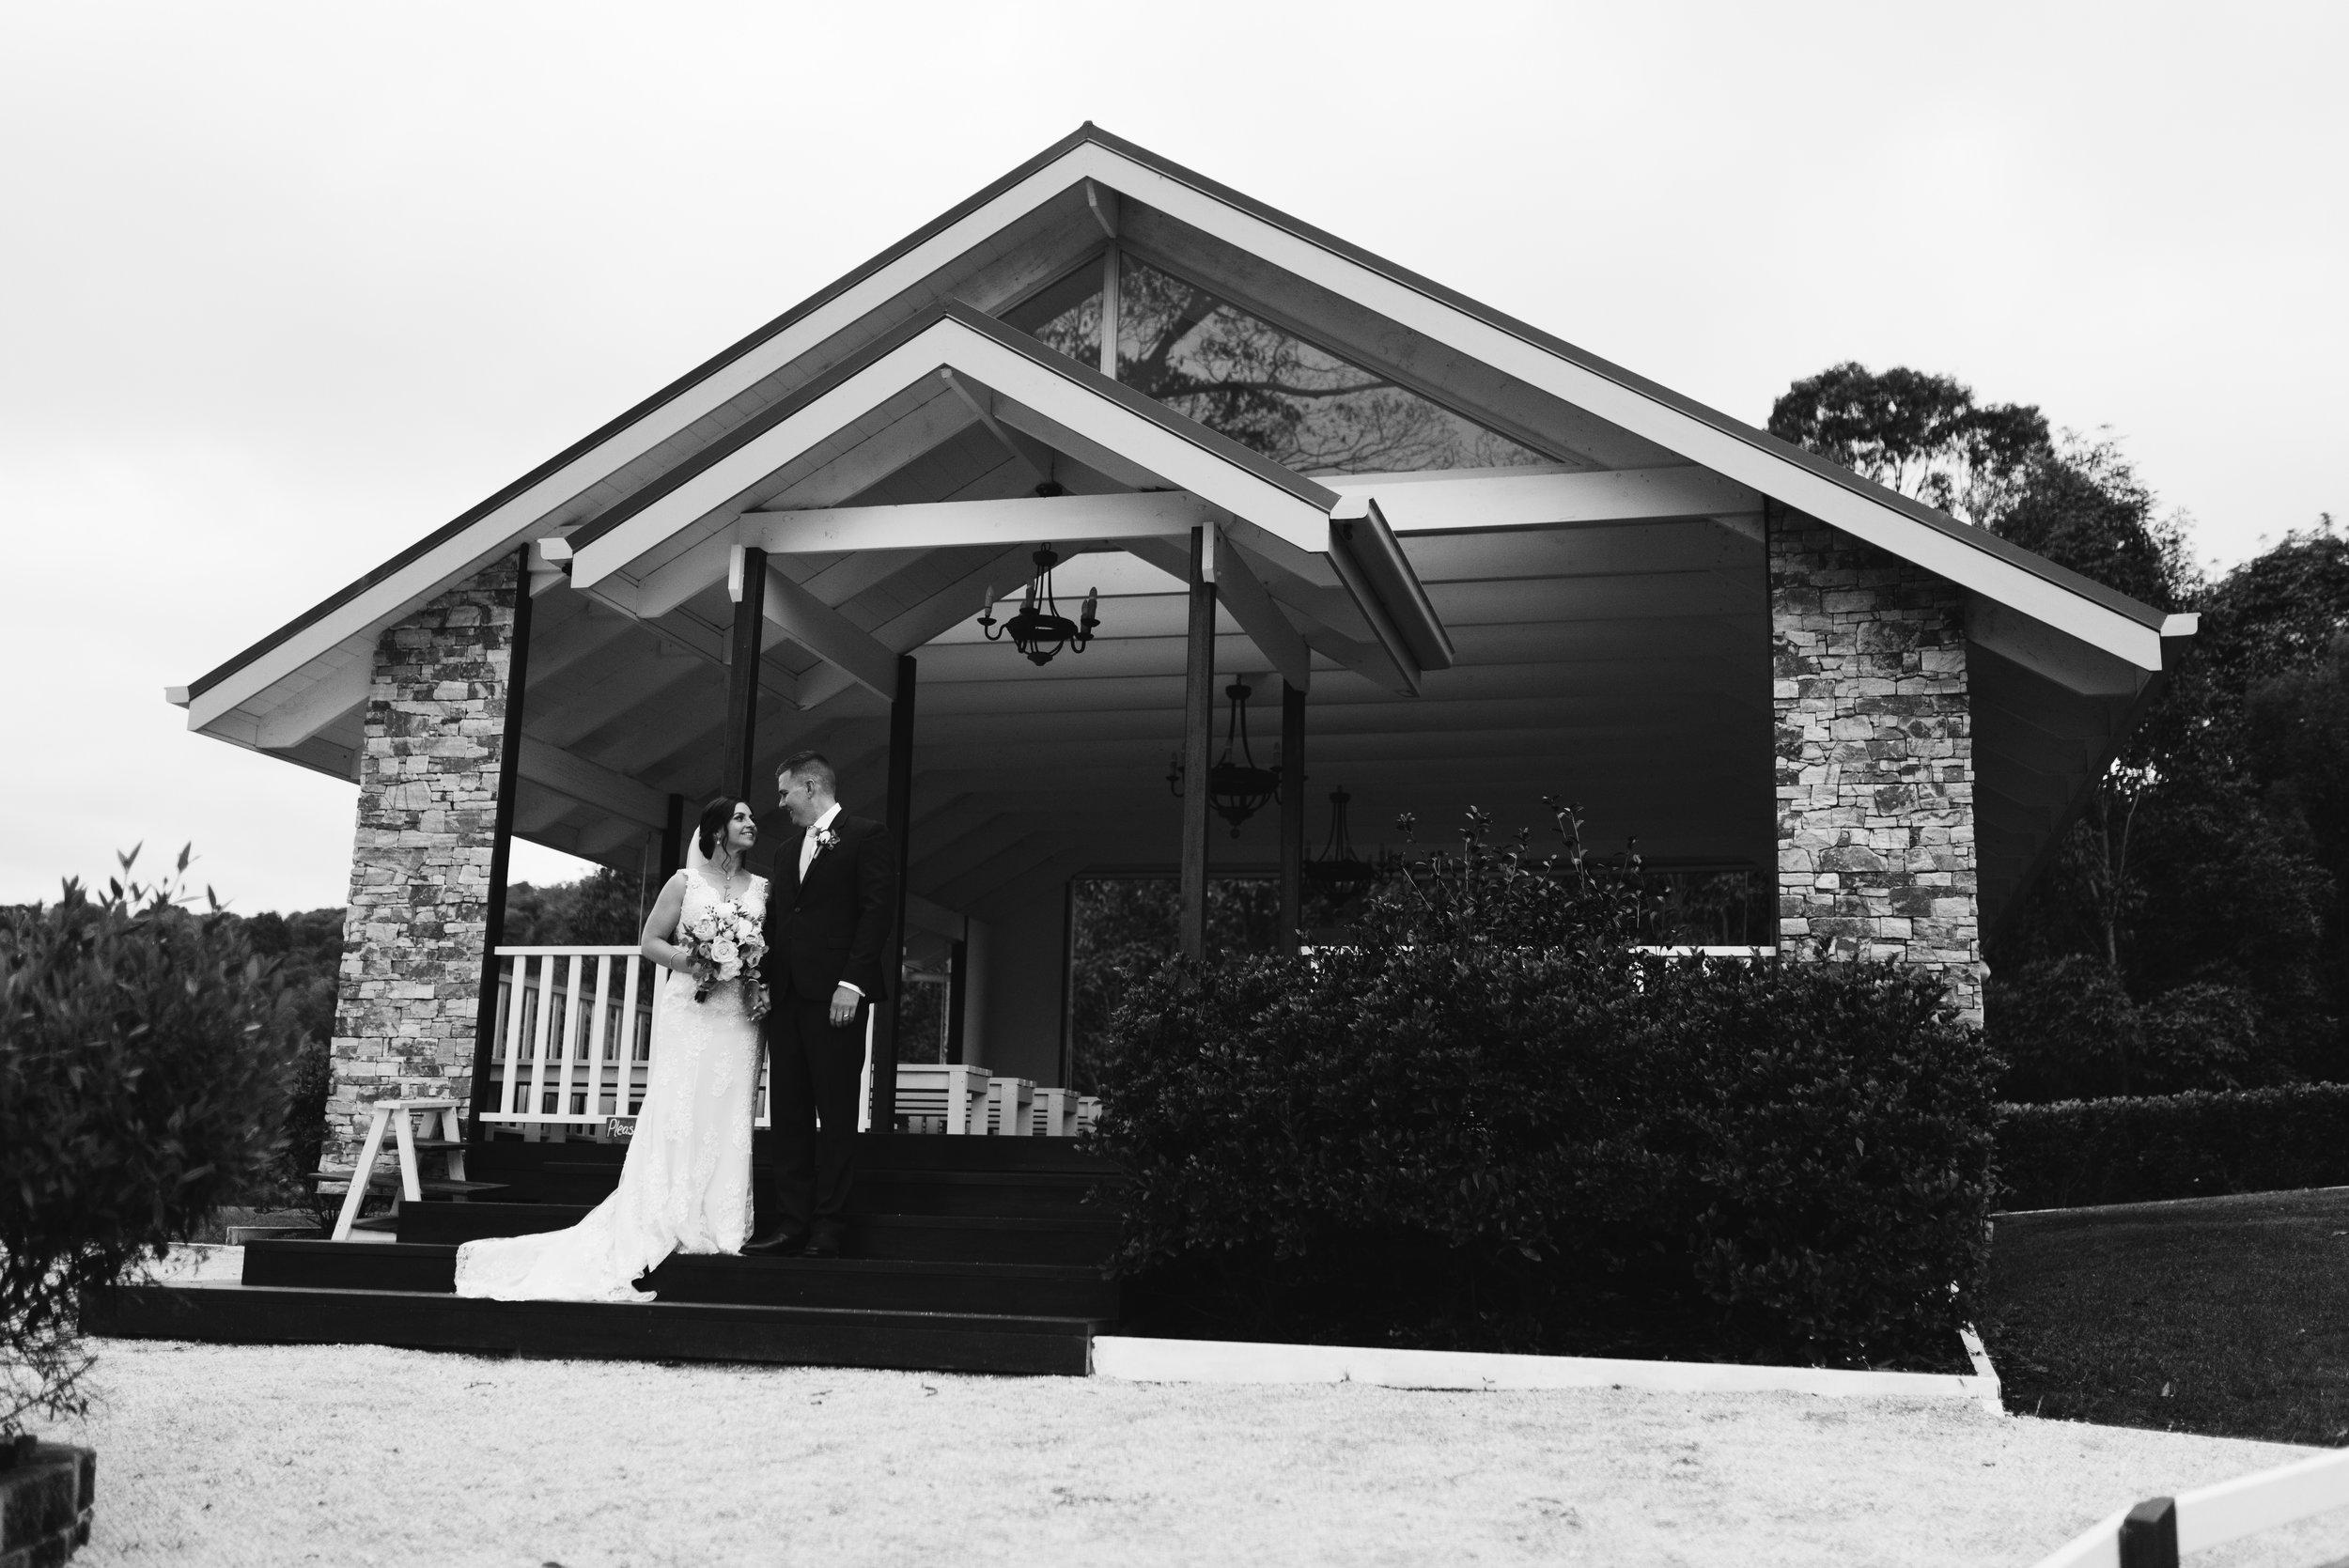 LAURENOLIVIA-austinvilla-estate-wedding-69.jpg